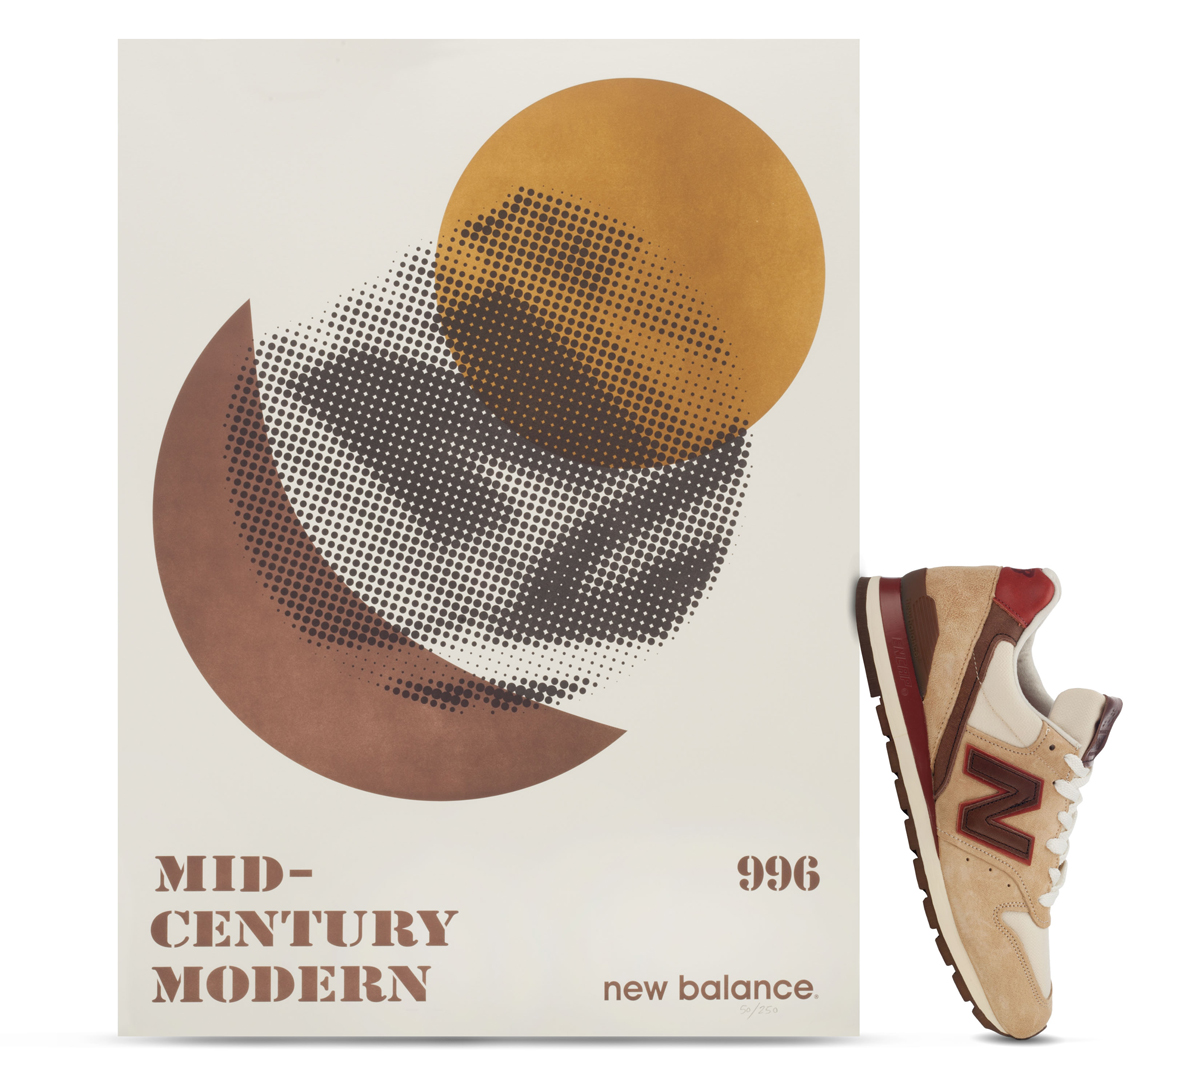 new-balance-mid-century-modern-collection-08